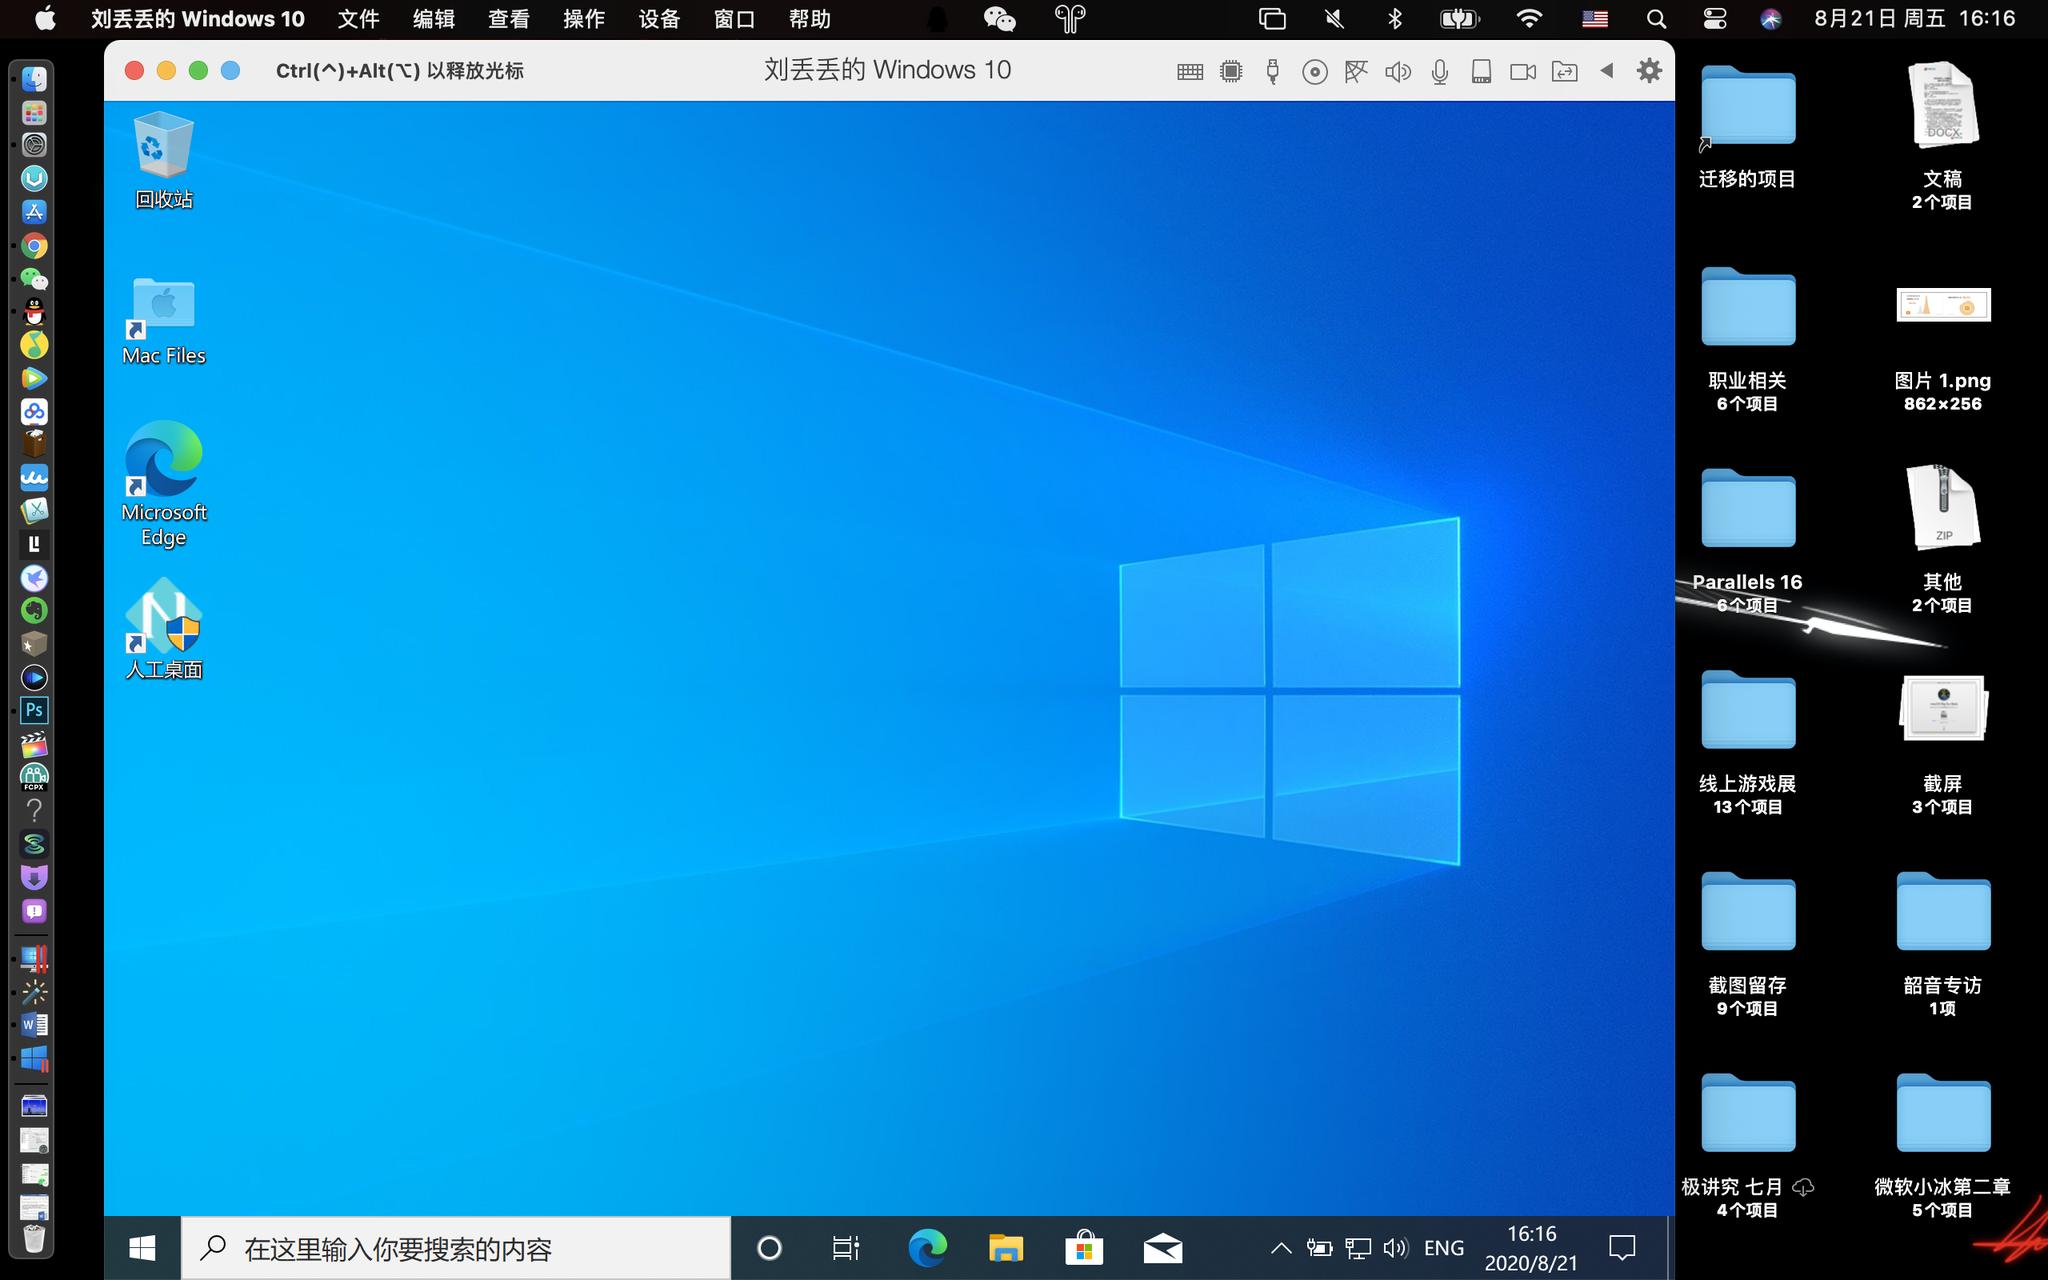 Parallels Desktop 16 for Mac试用 支持ARM架构的苹果自研处理器